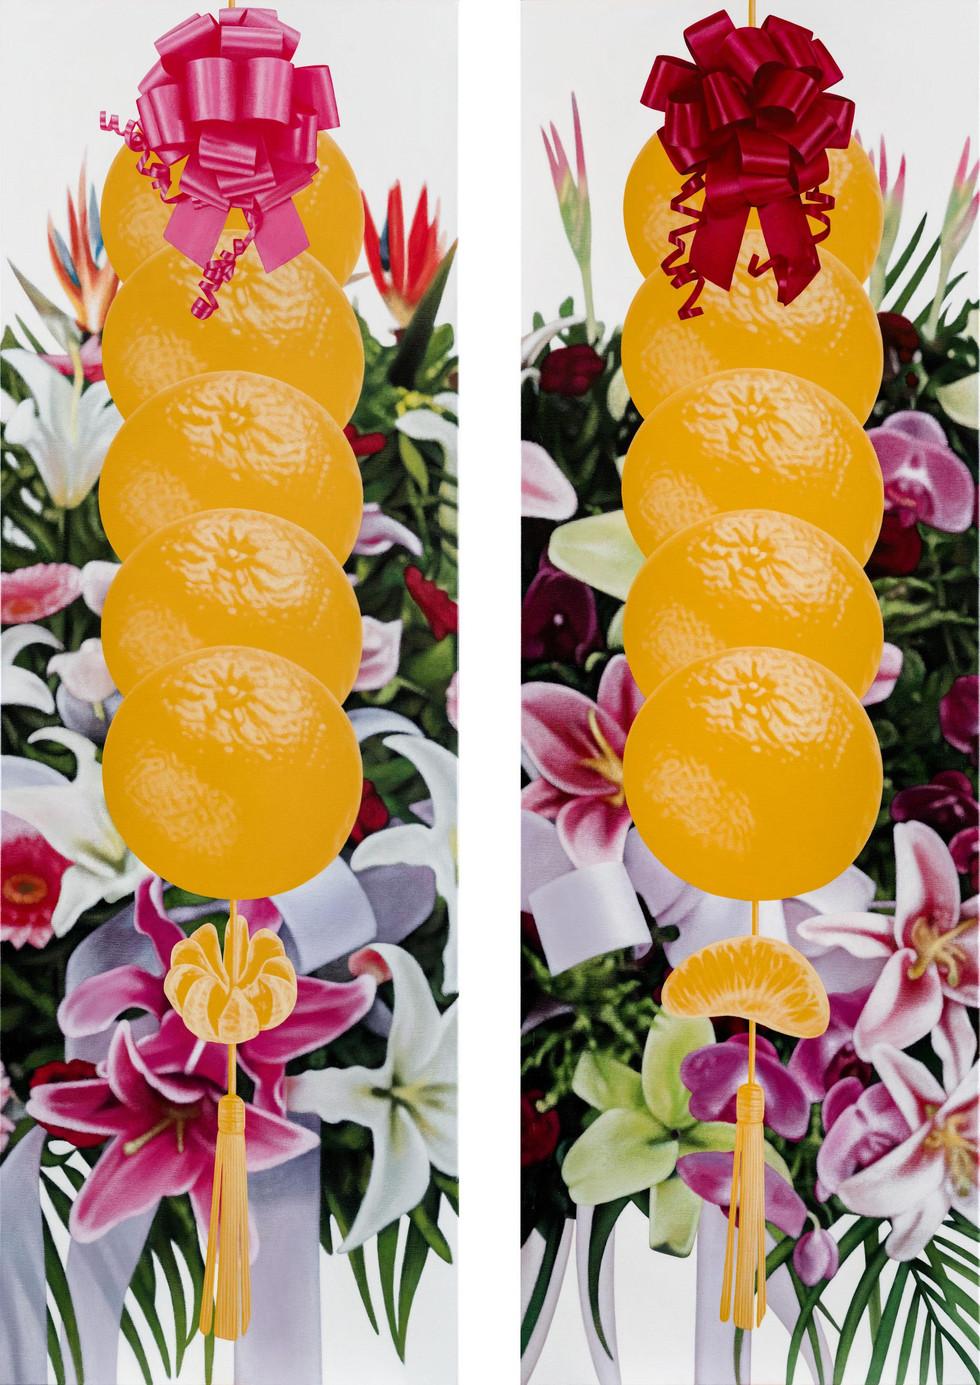 五橘、花對聯 / Five Oranges, Flower Couplet